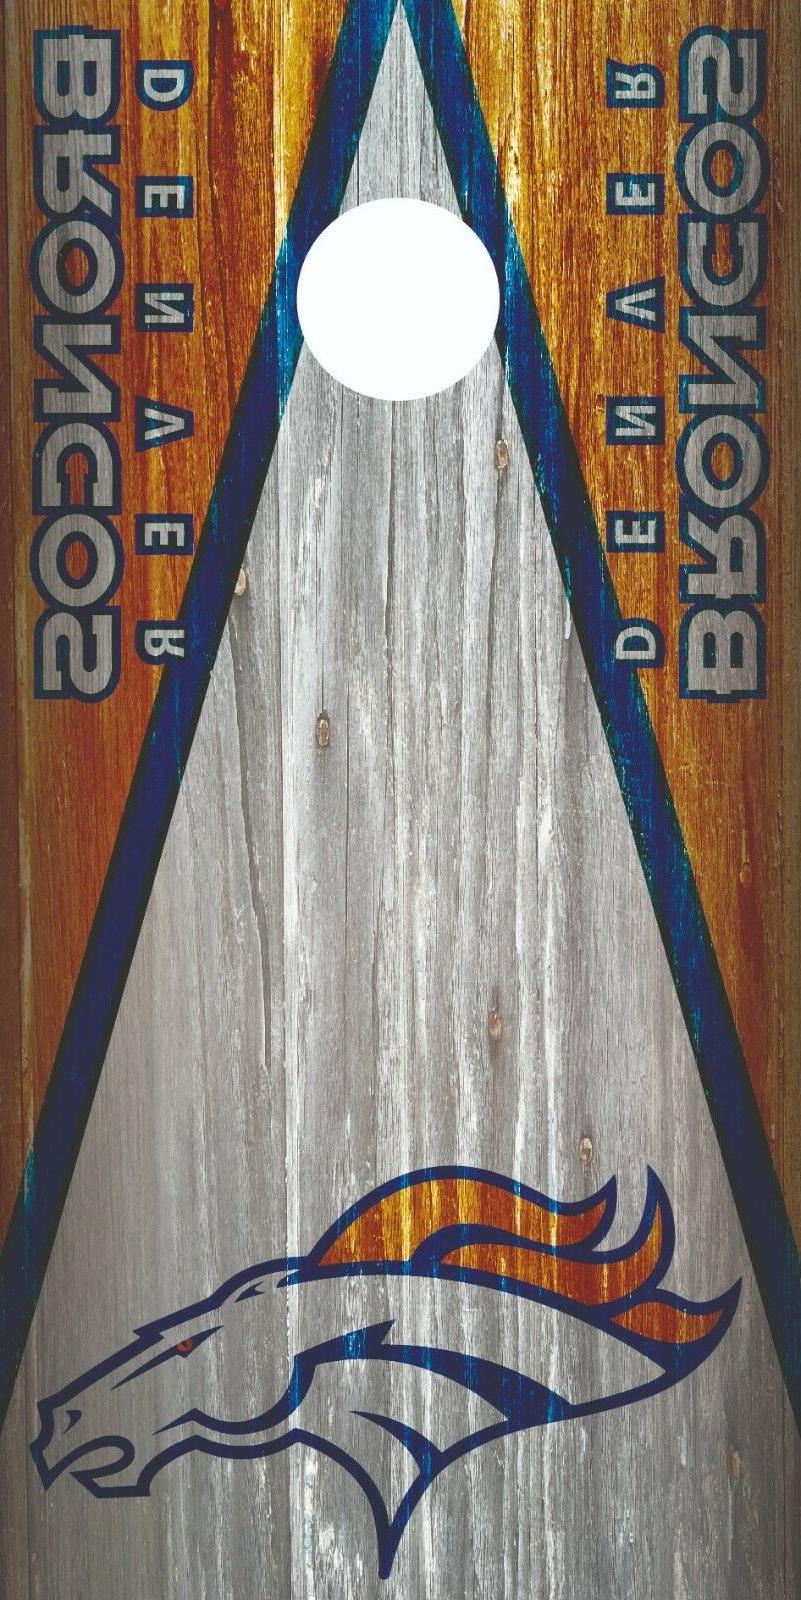 denver broncos cornhole wrap board decal nfl